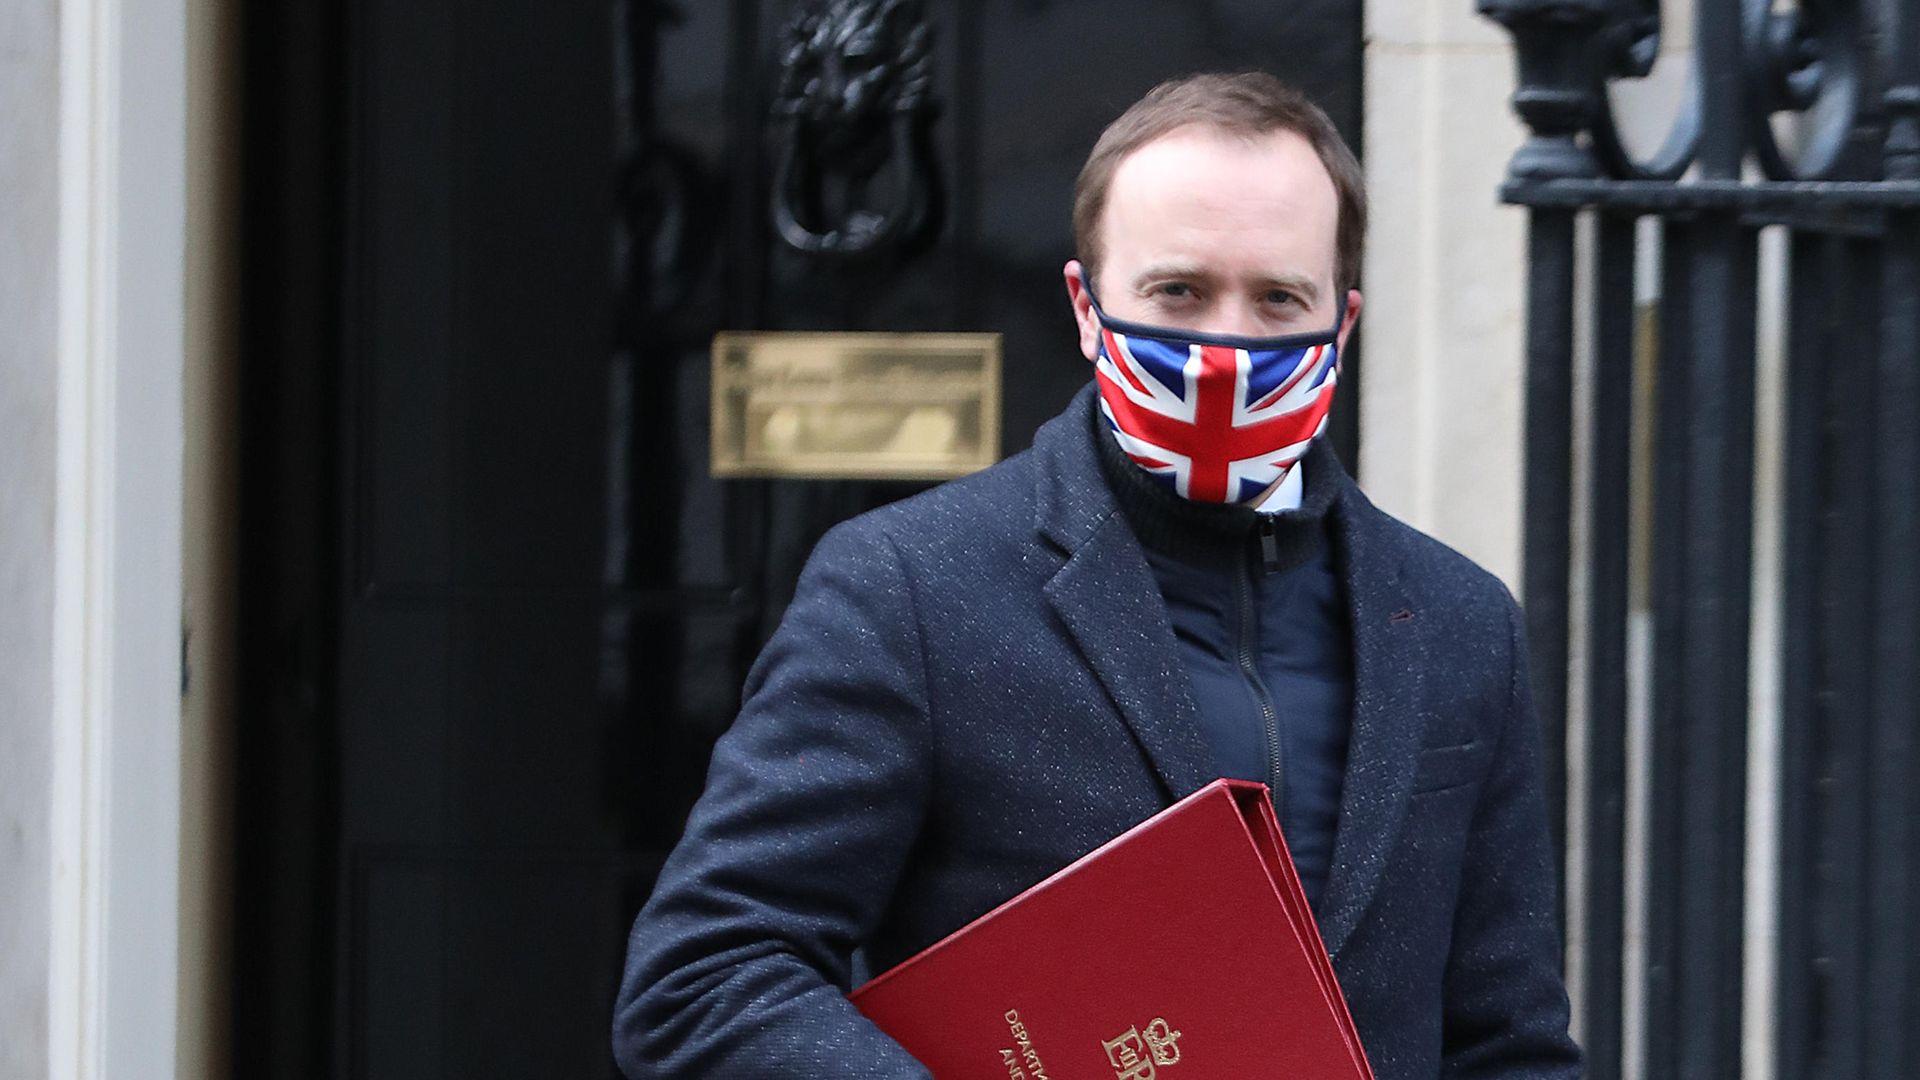 Health Secretary Matt Hancock leaves 10 Downing Street - Credit: PA